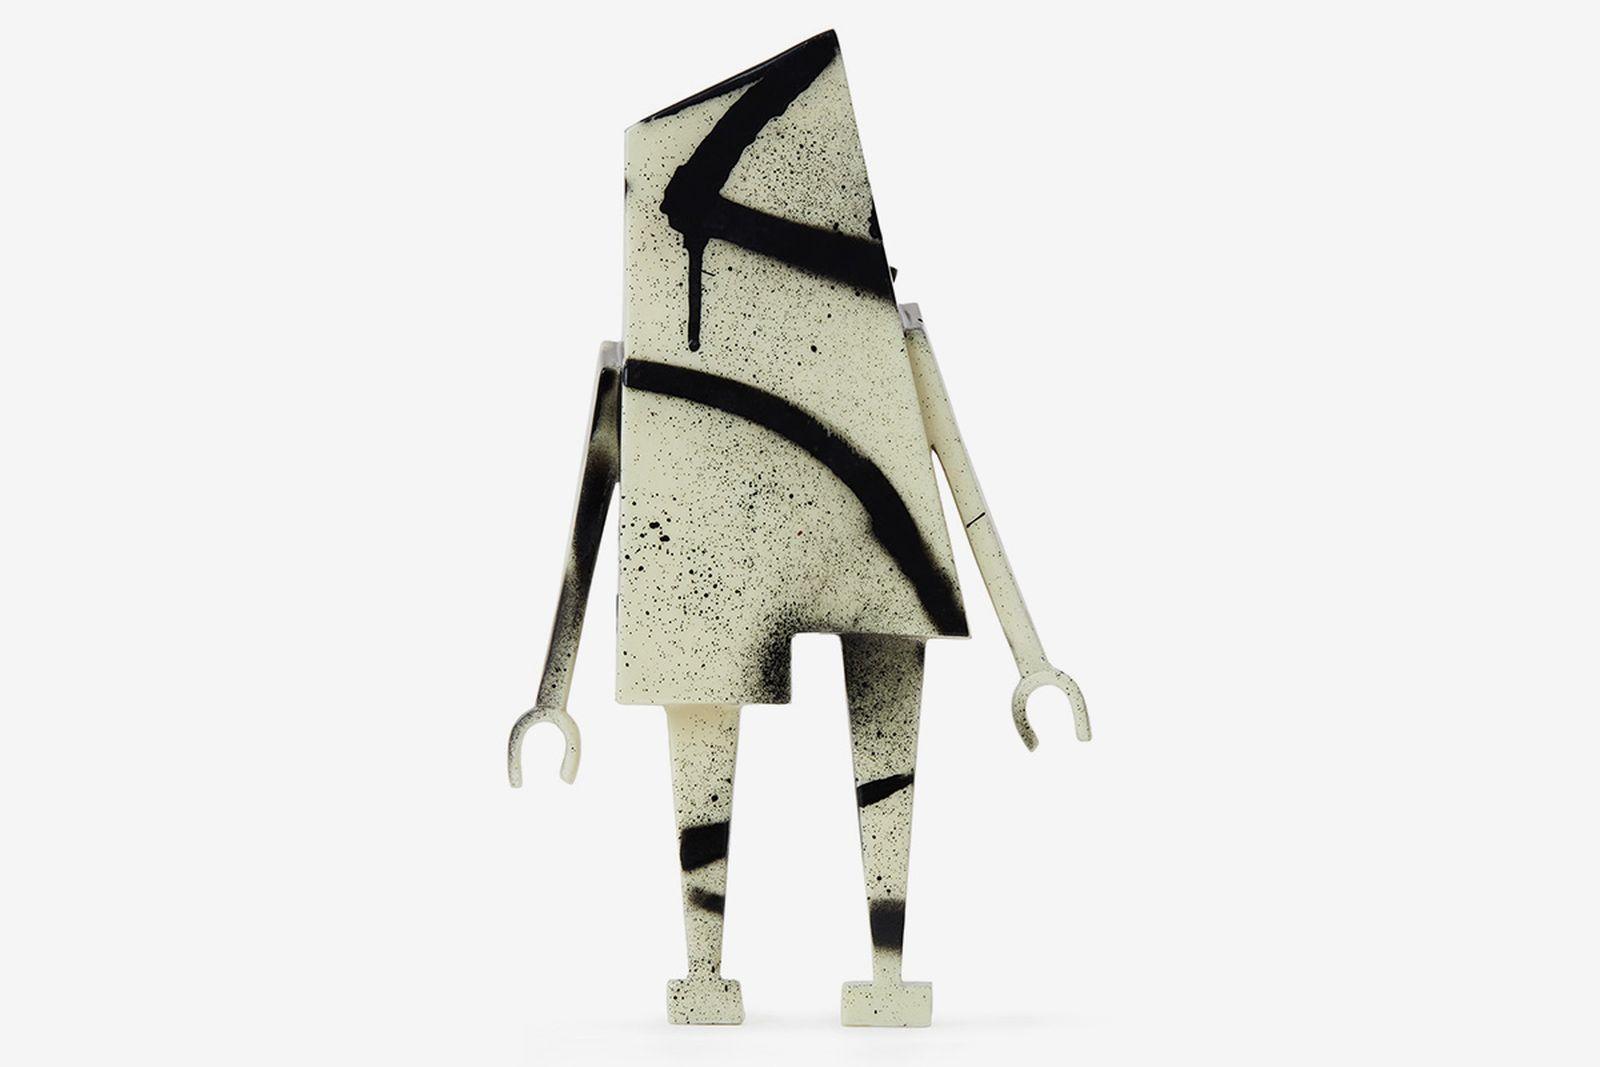 futura concrete objects null figure samuel ross